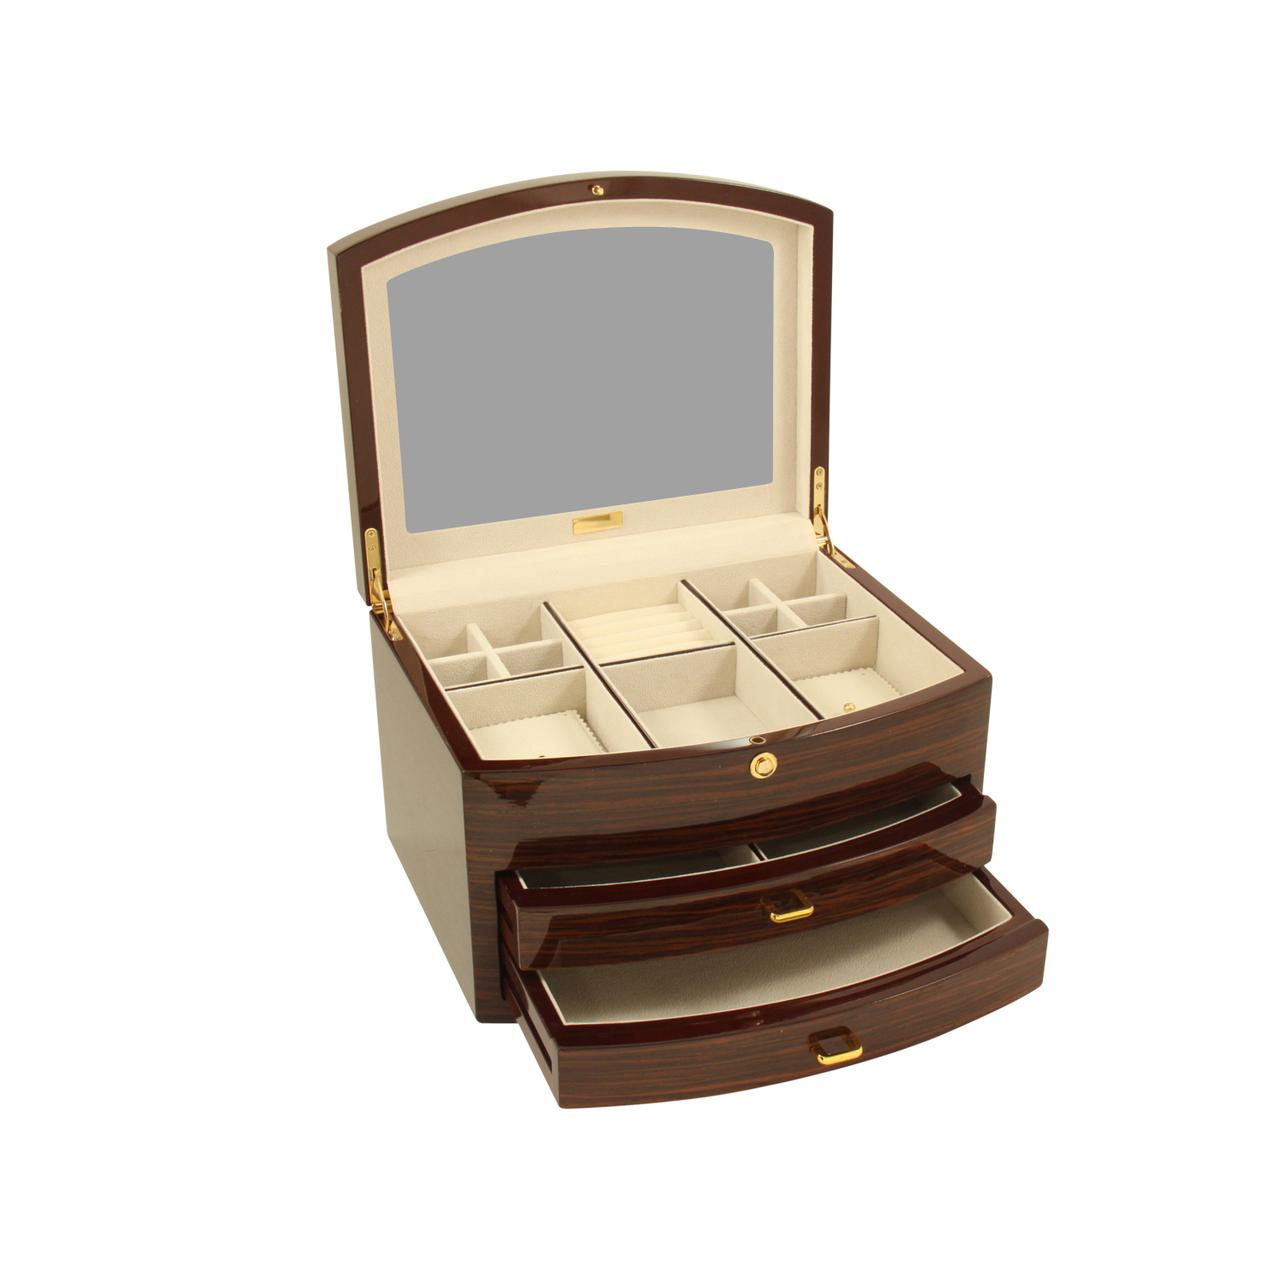 Zebra Wood Jewelry Box House of Clocks